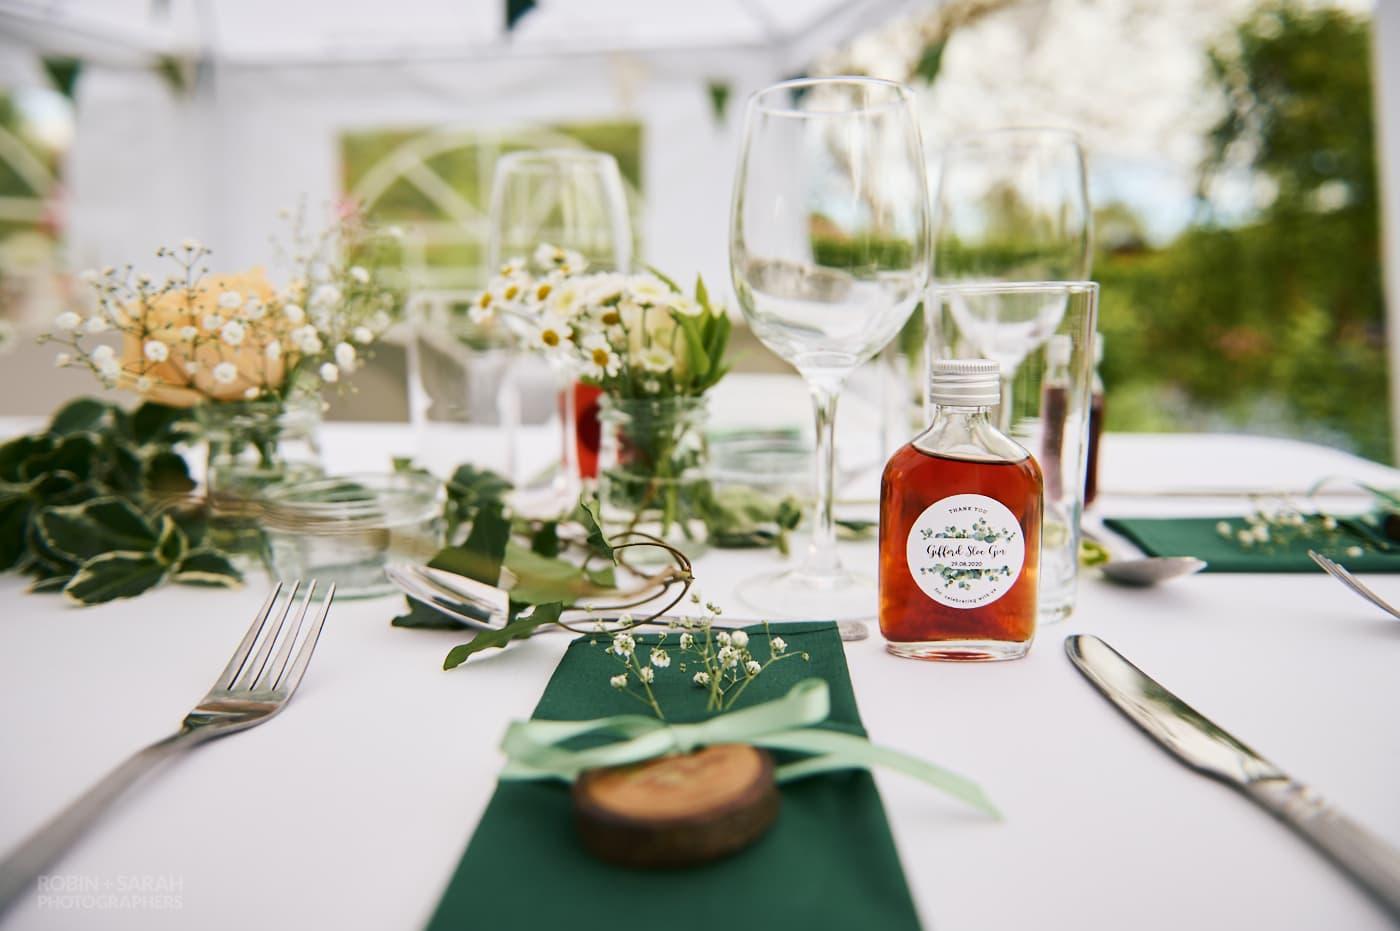 Table details at garden wedding